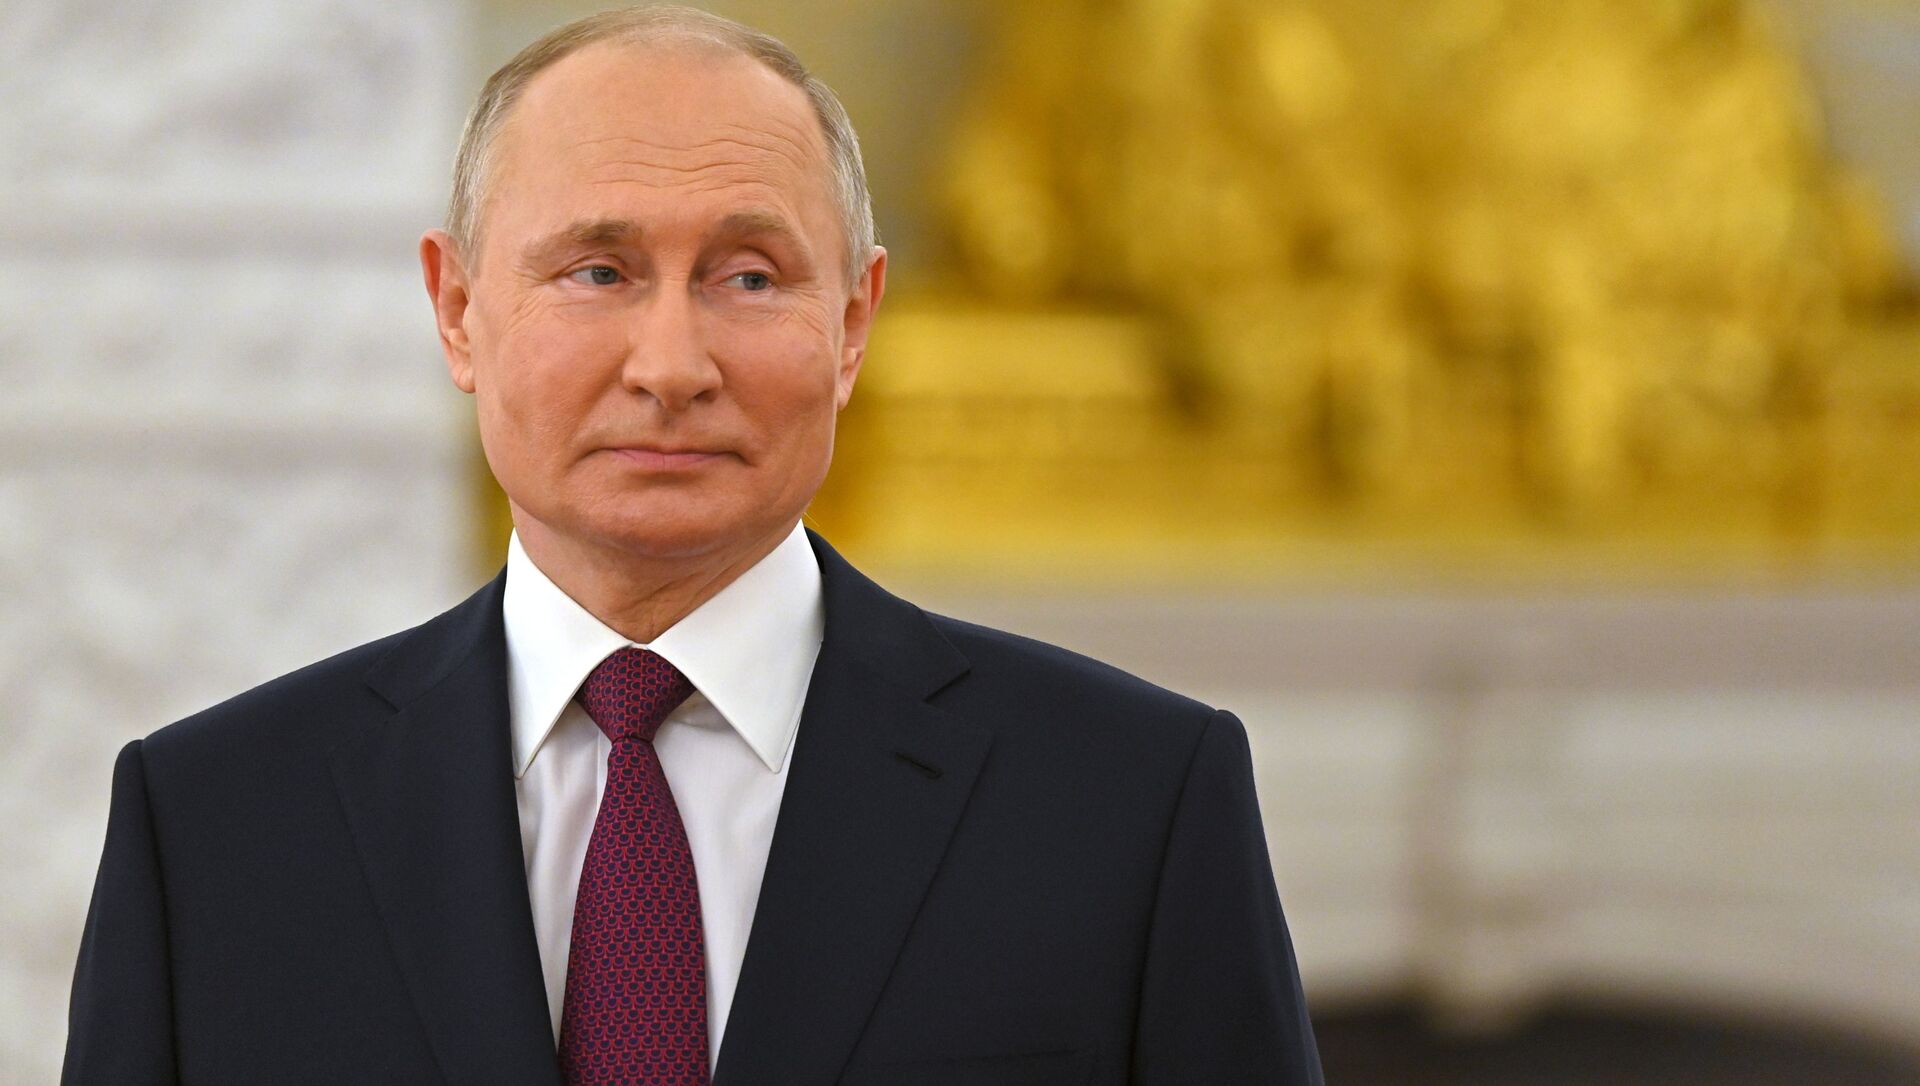 Prezydent Rosji Władimir Putin. - Sputnik Polska, 1920, 12.06.2021